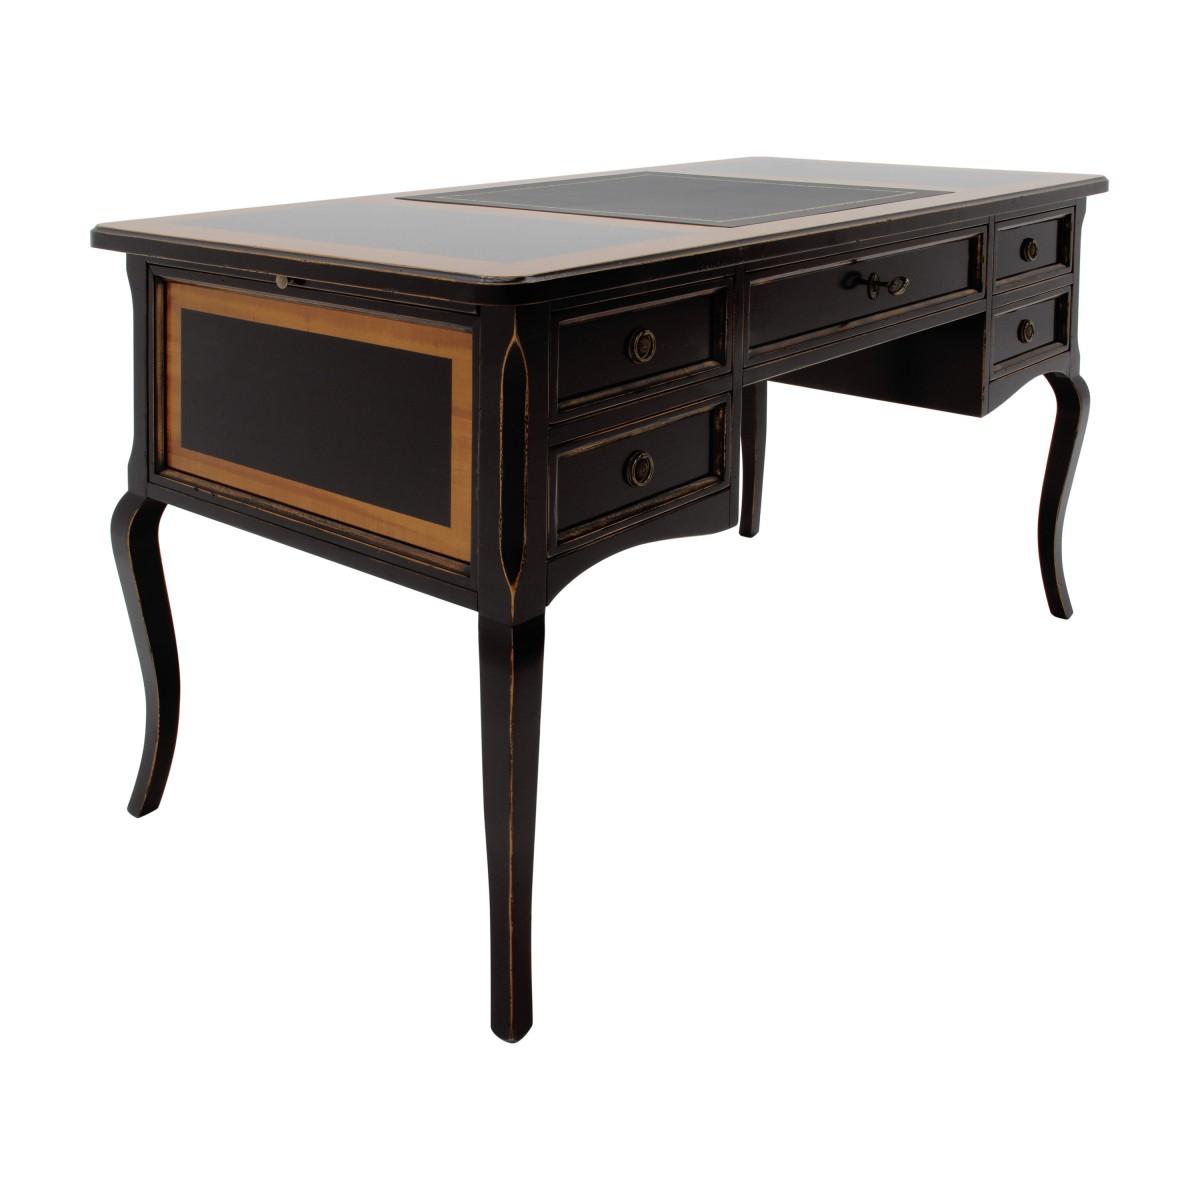 italian classic writing desk perseo 2 102